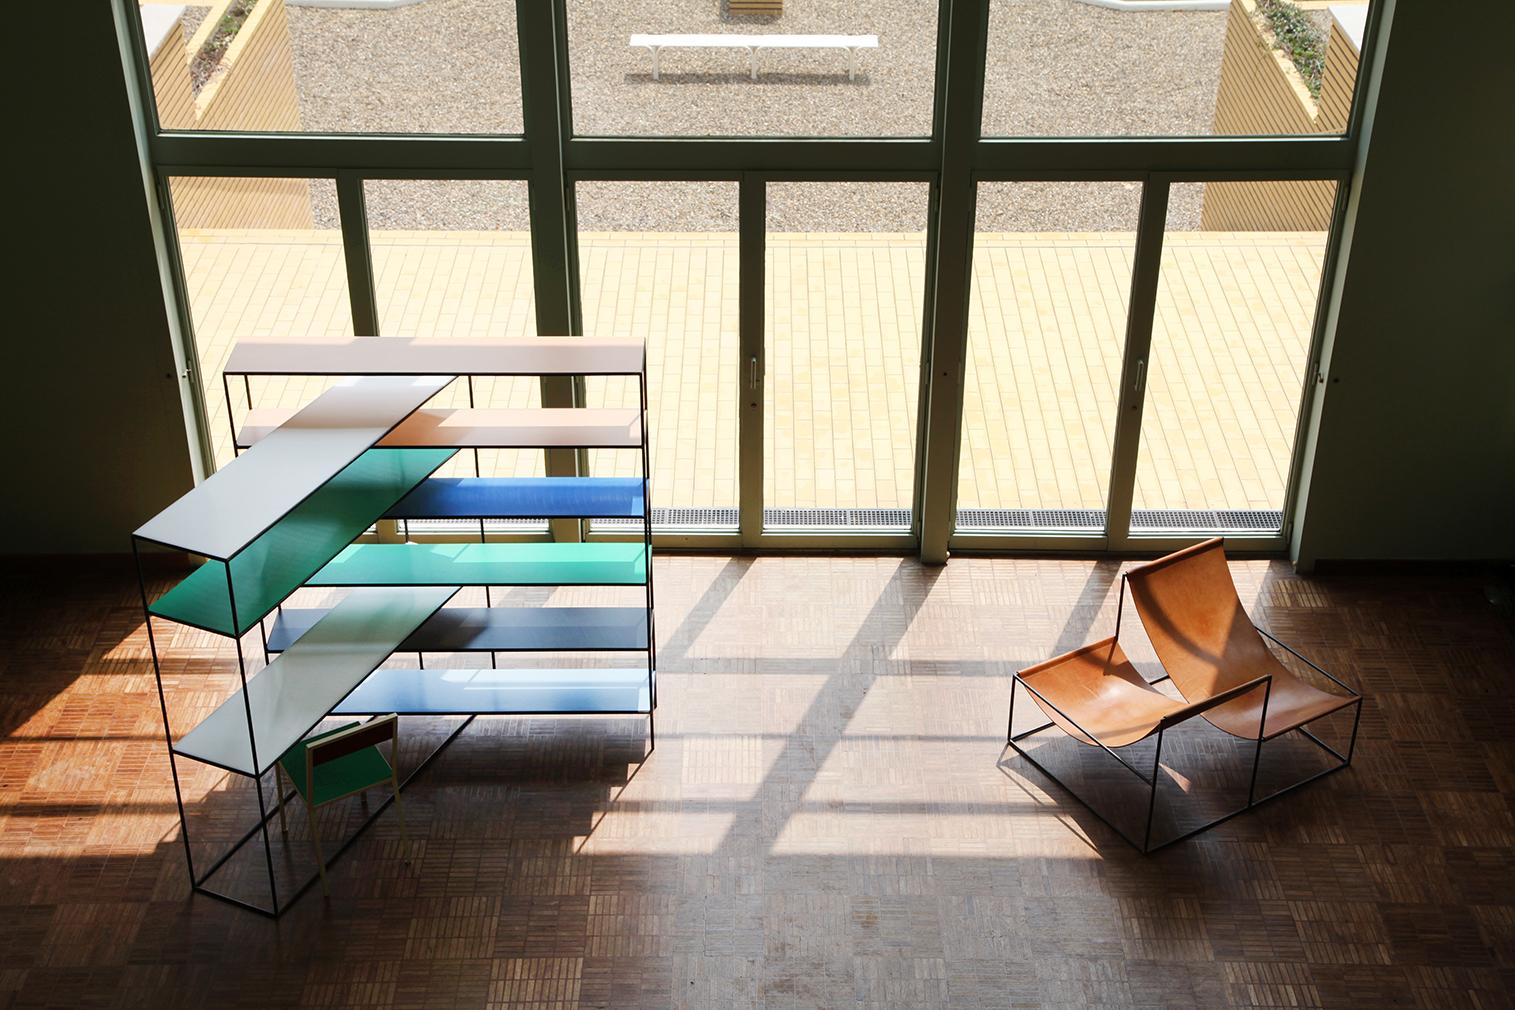 Muller van Severen's ALLTUBES series on show at Villa Cavrois - installation view